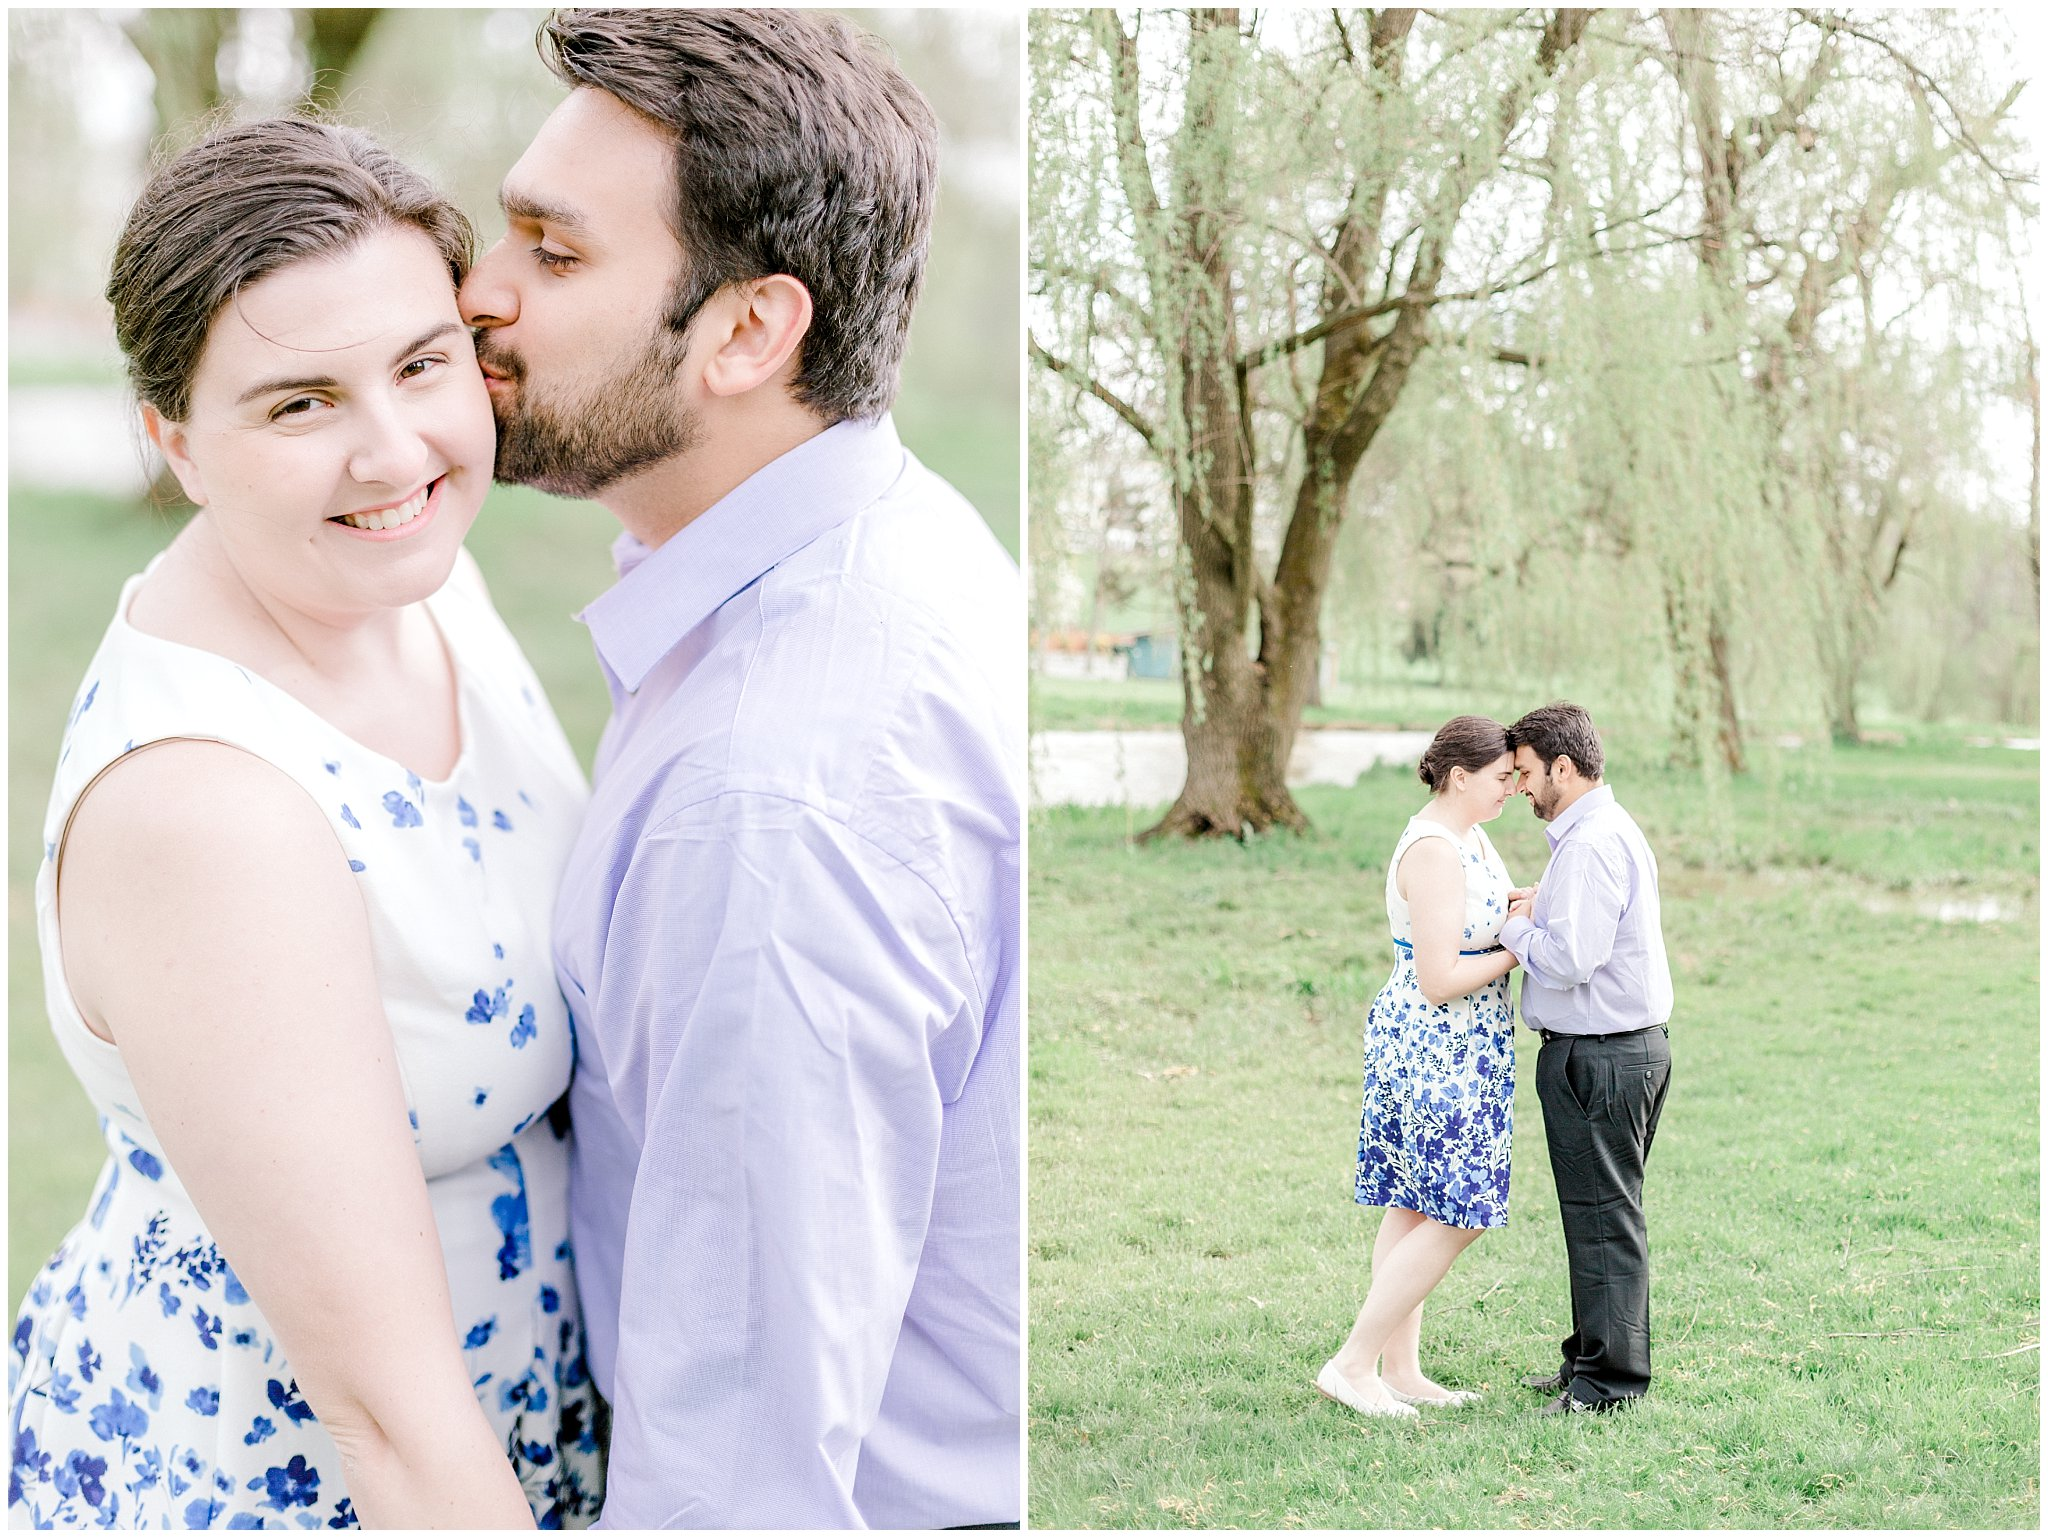 Lehigh Valley Spring Cherry Blossom Engagement Session Pennsylvania Wedding Photographer (3).jpg